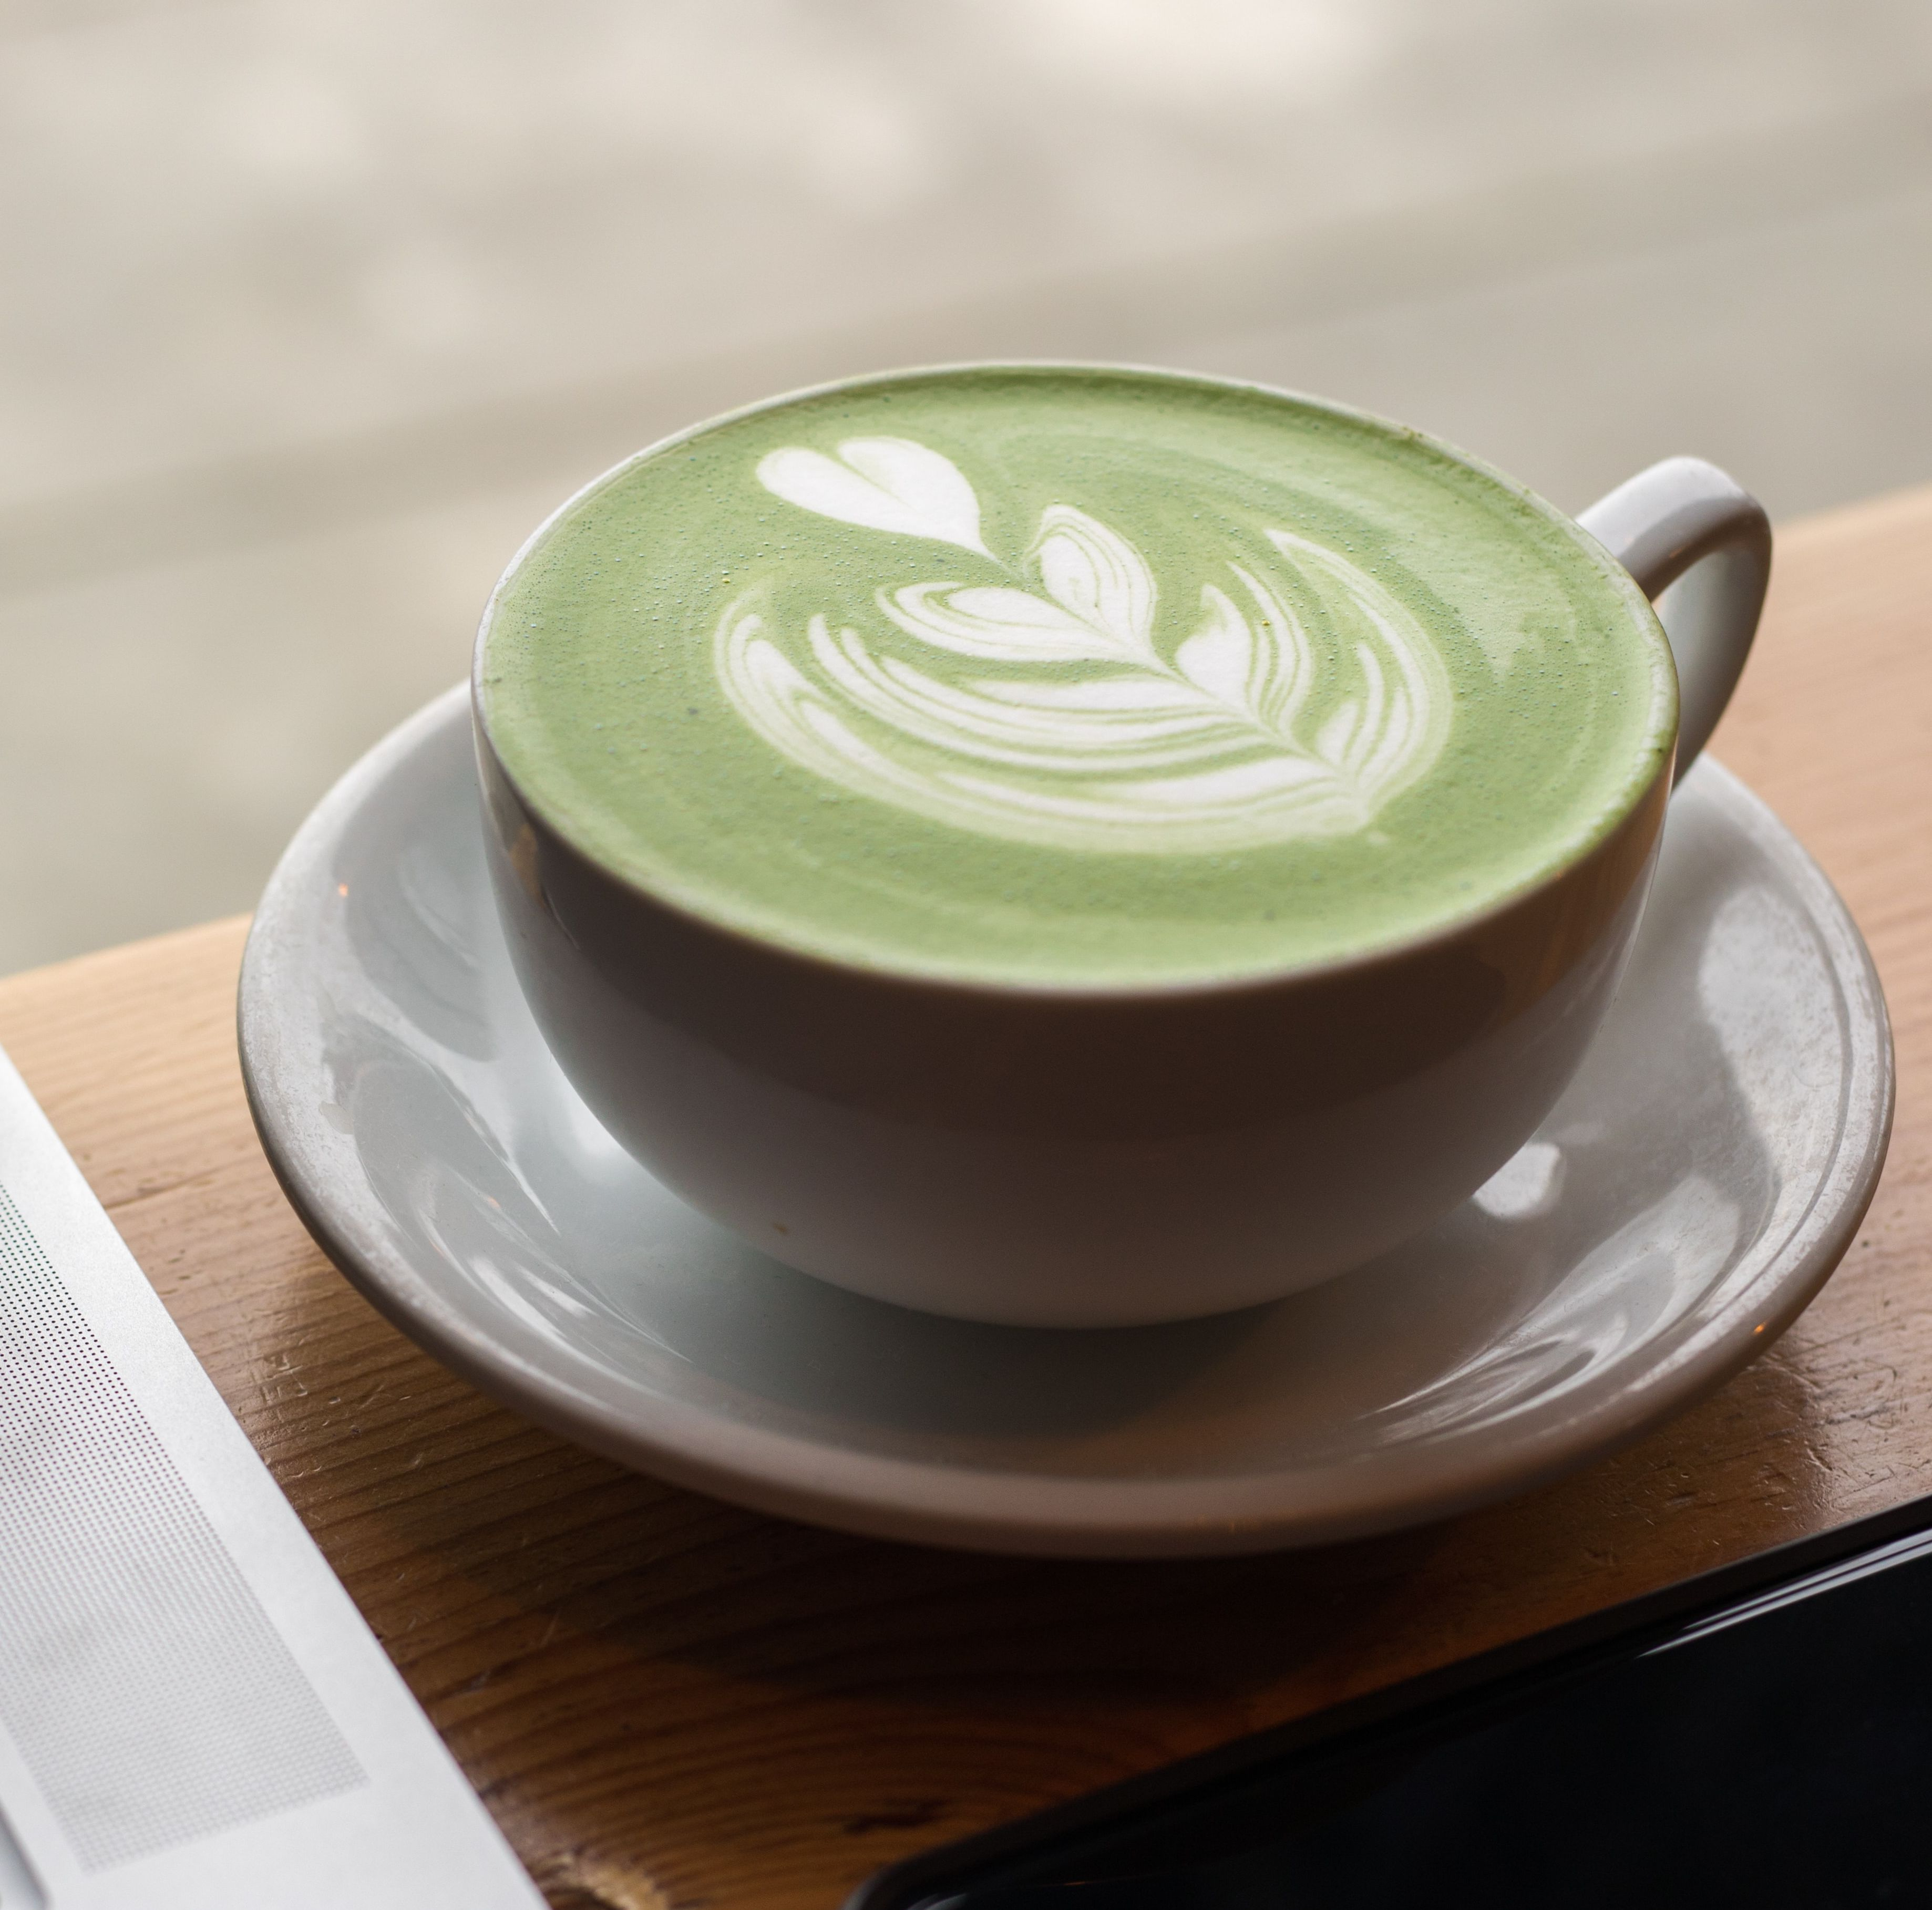 Latte Matcha: Productos de Kin+Ilk Café